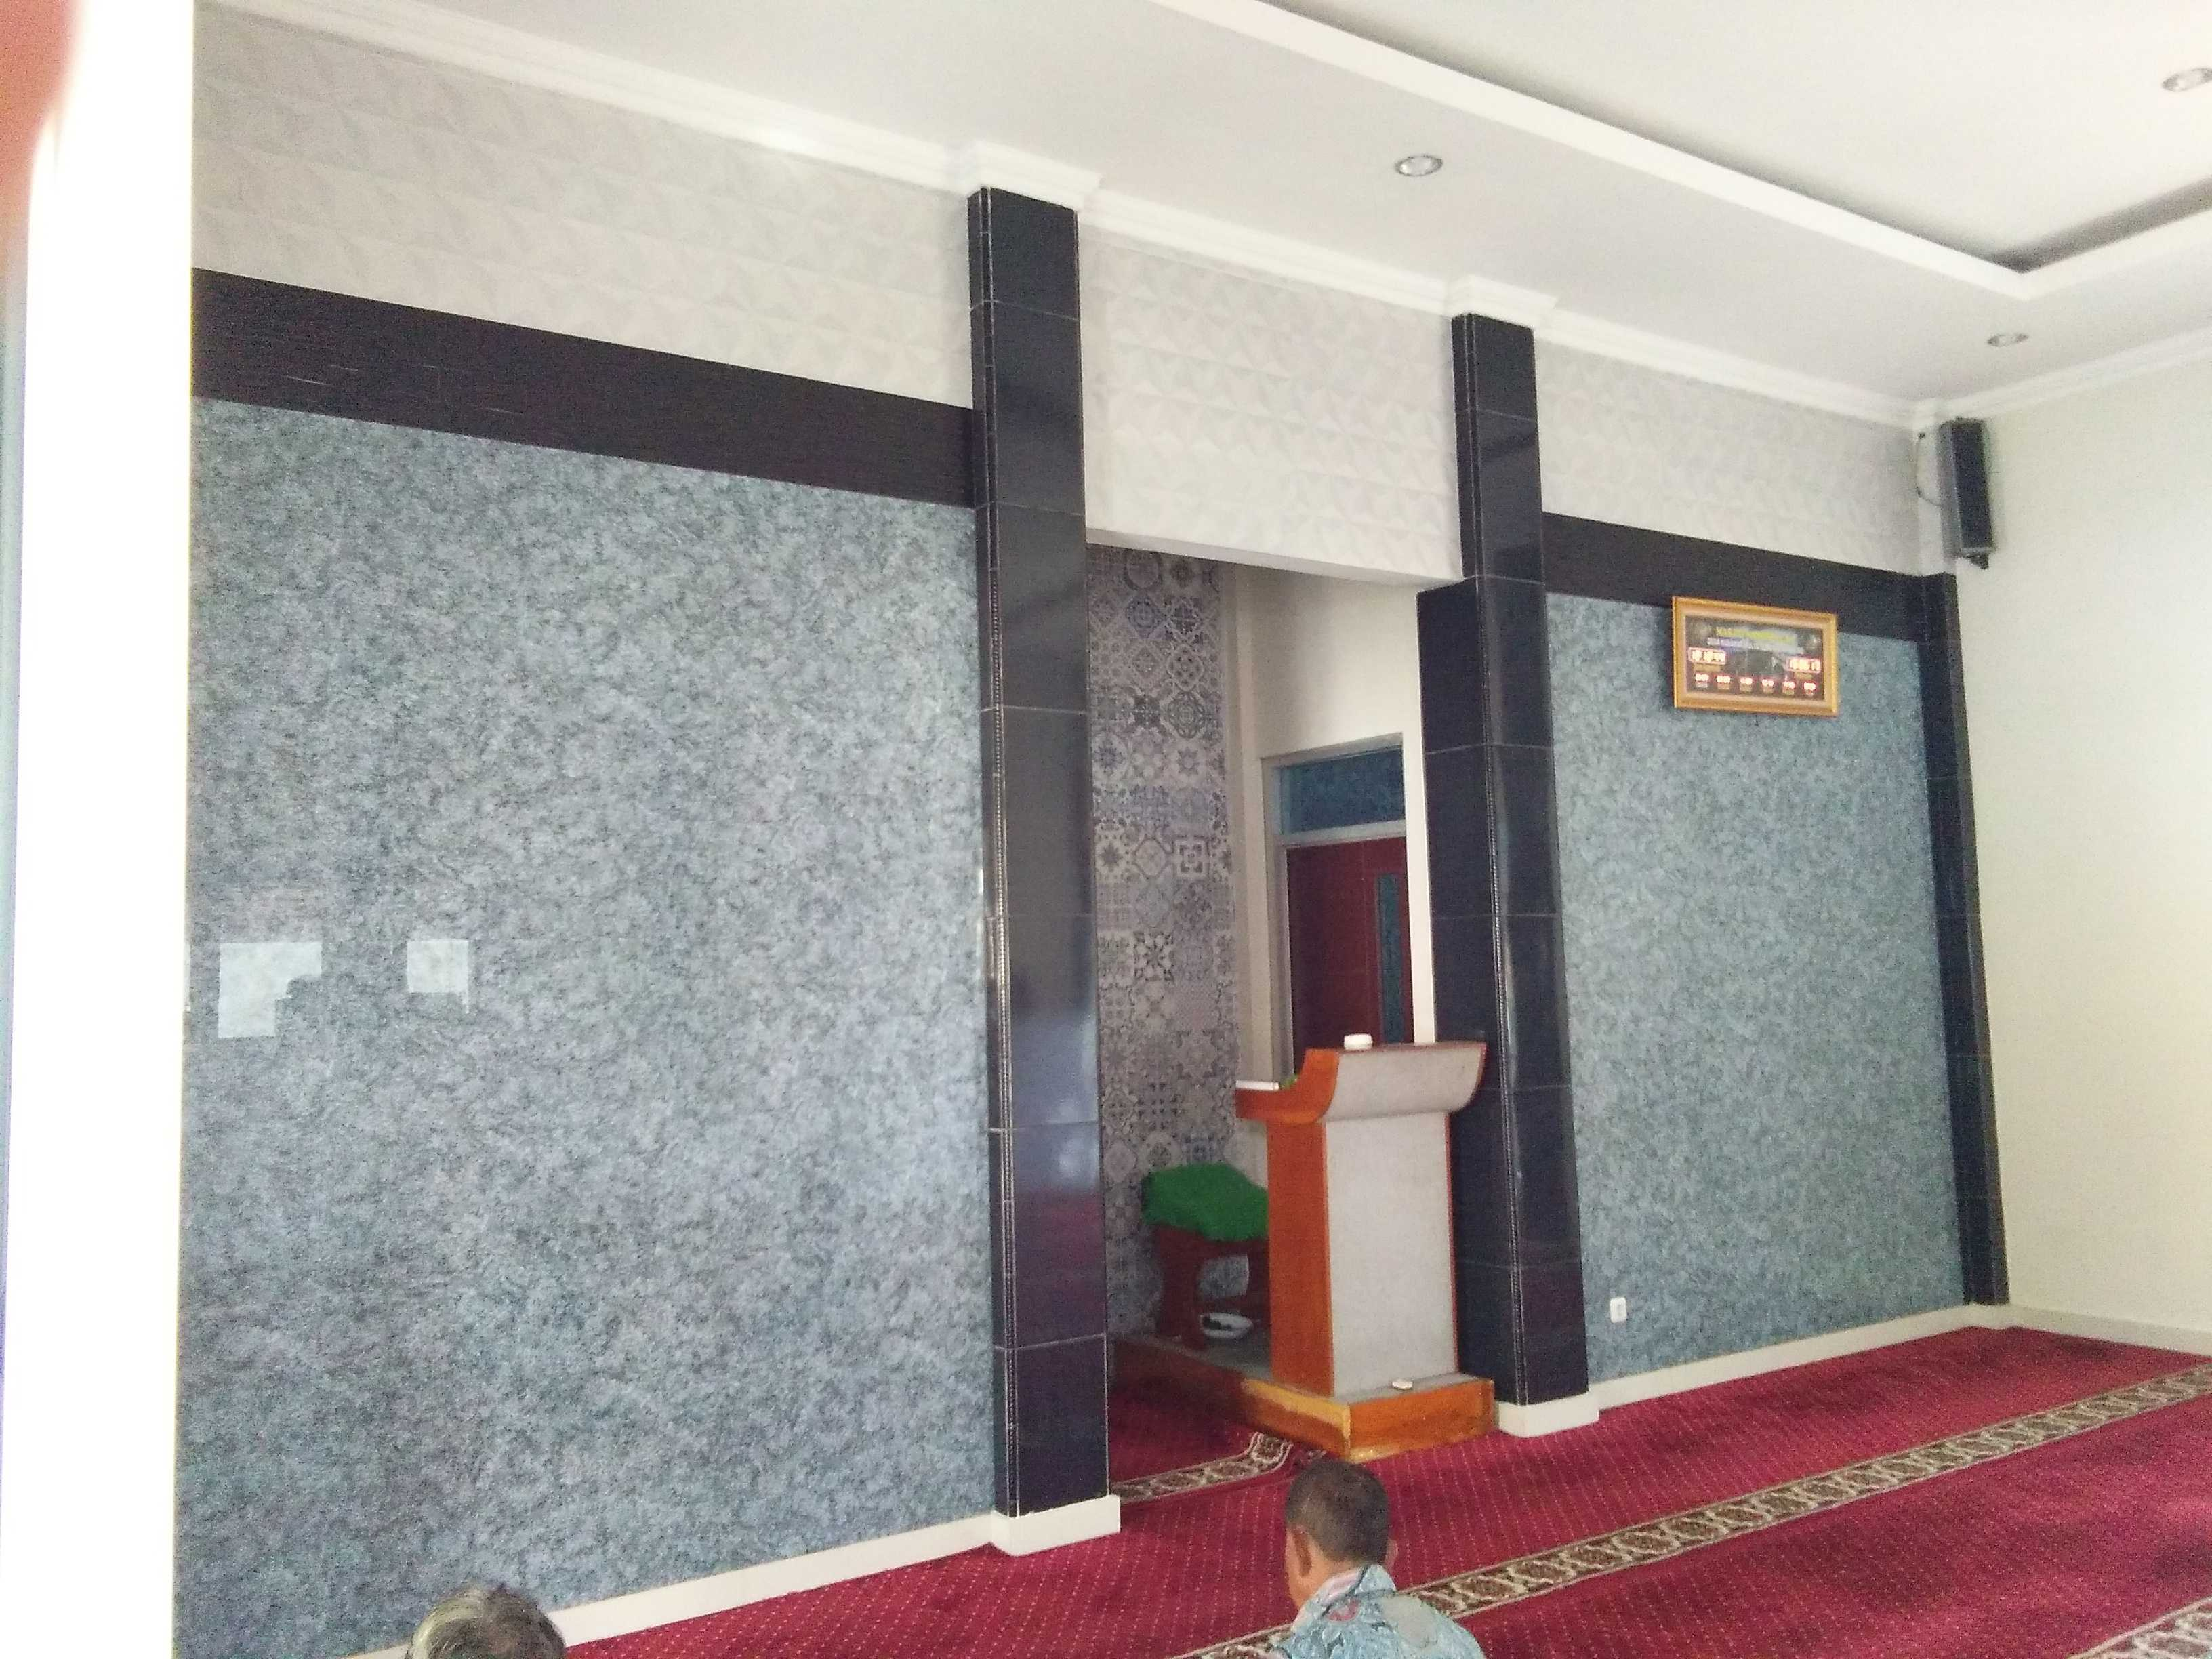 Archdesignbuild7 Mesjid Nasrullah  Soreang, West Java Soreang, West Java Andiyanto-Purwonost-Mesjid-Nasrullah-   57342